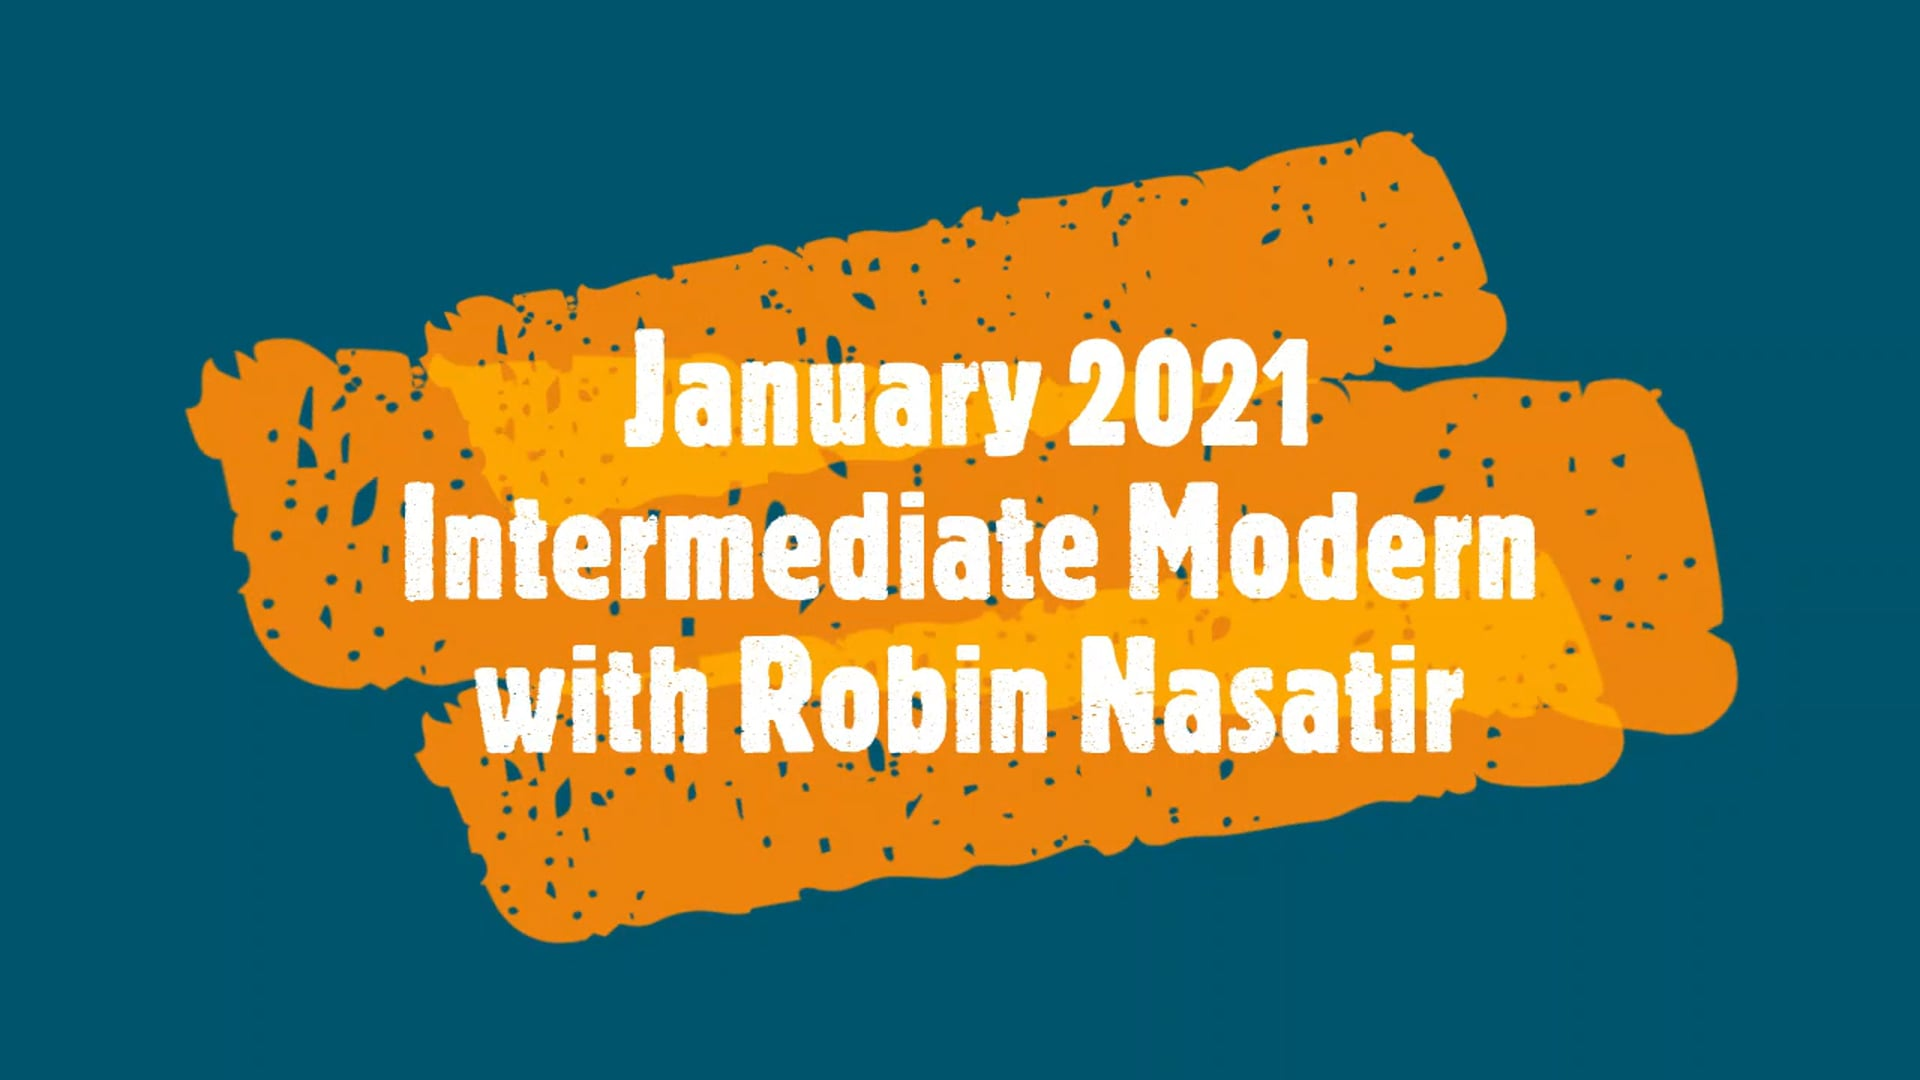 January 2021 Intermediate Modern Dance for 50+